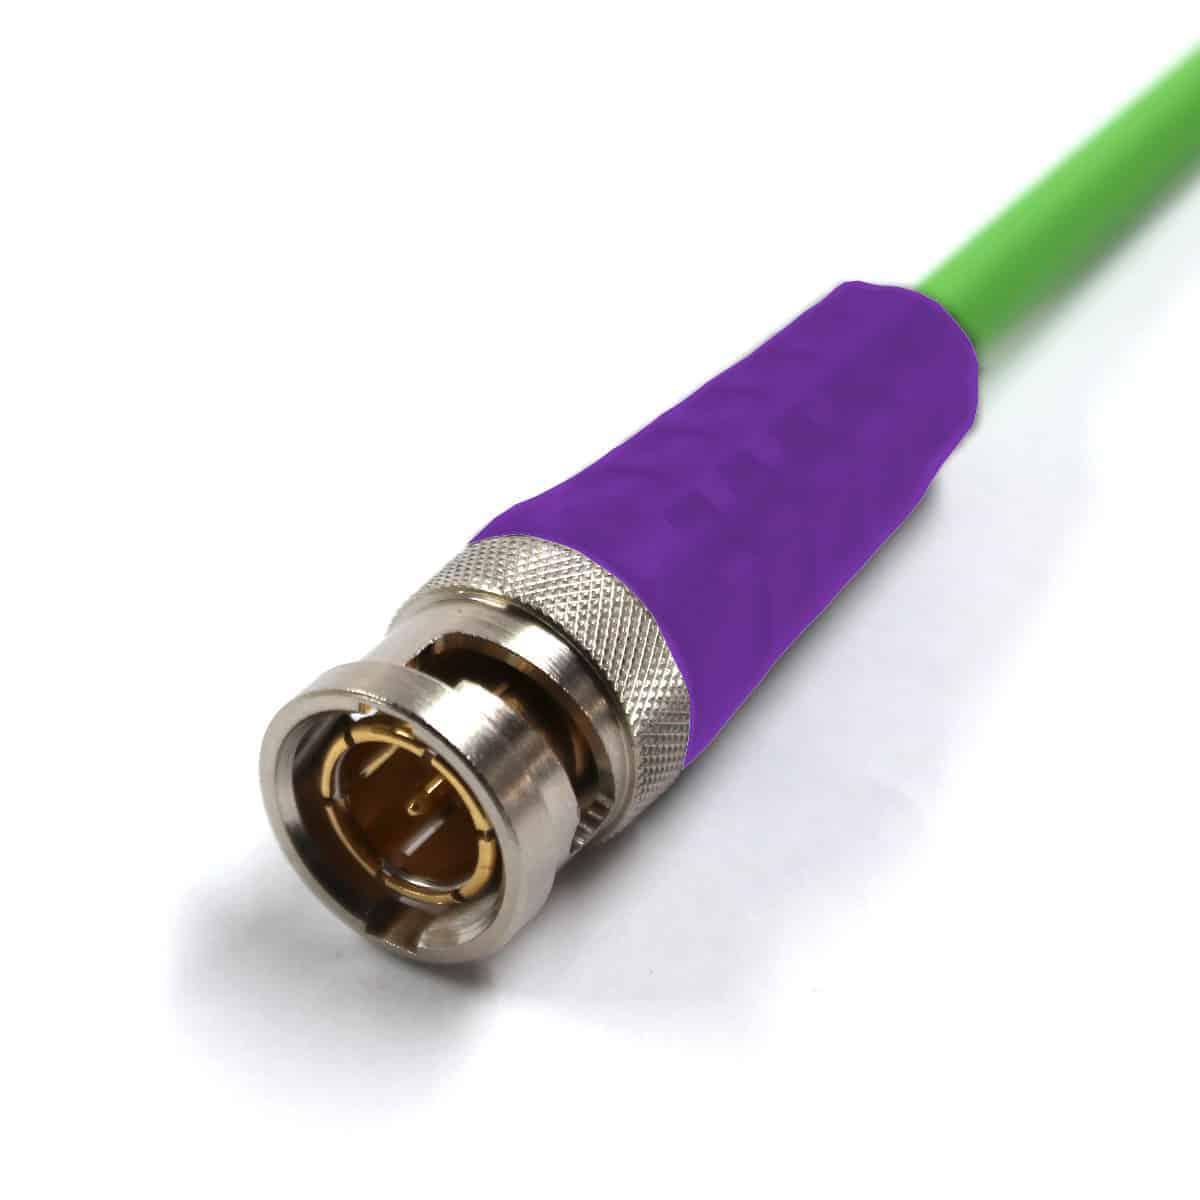 BNC Plug with violet sleeve